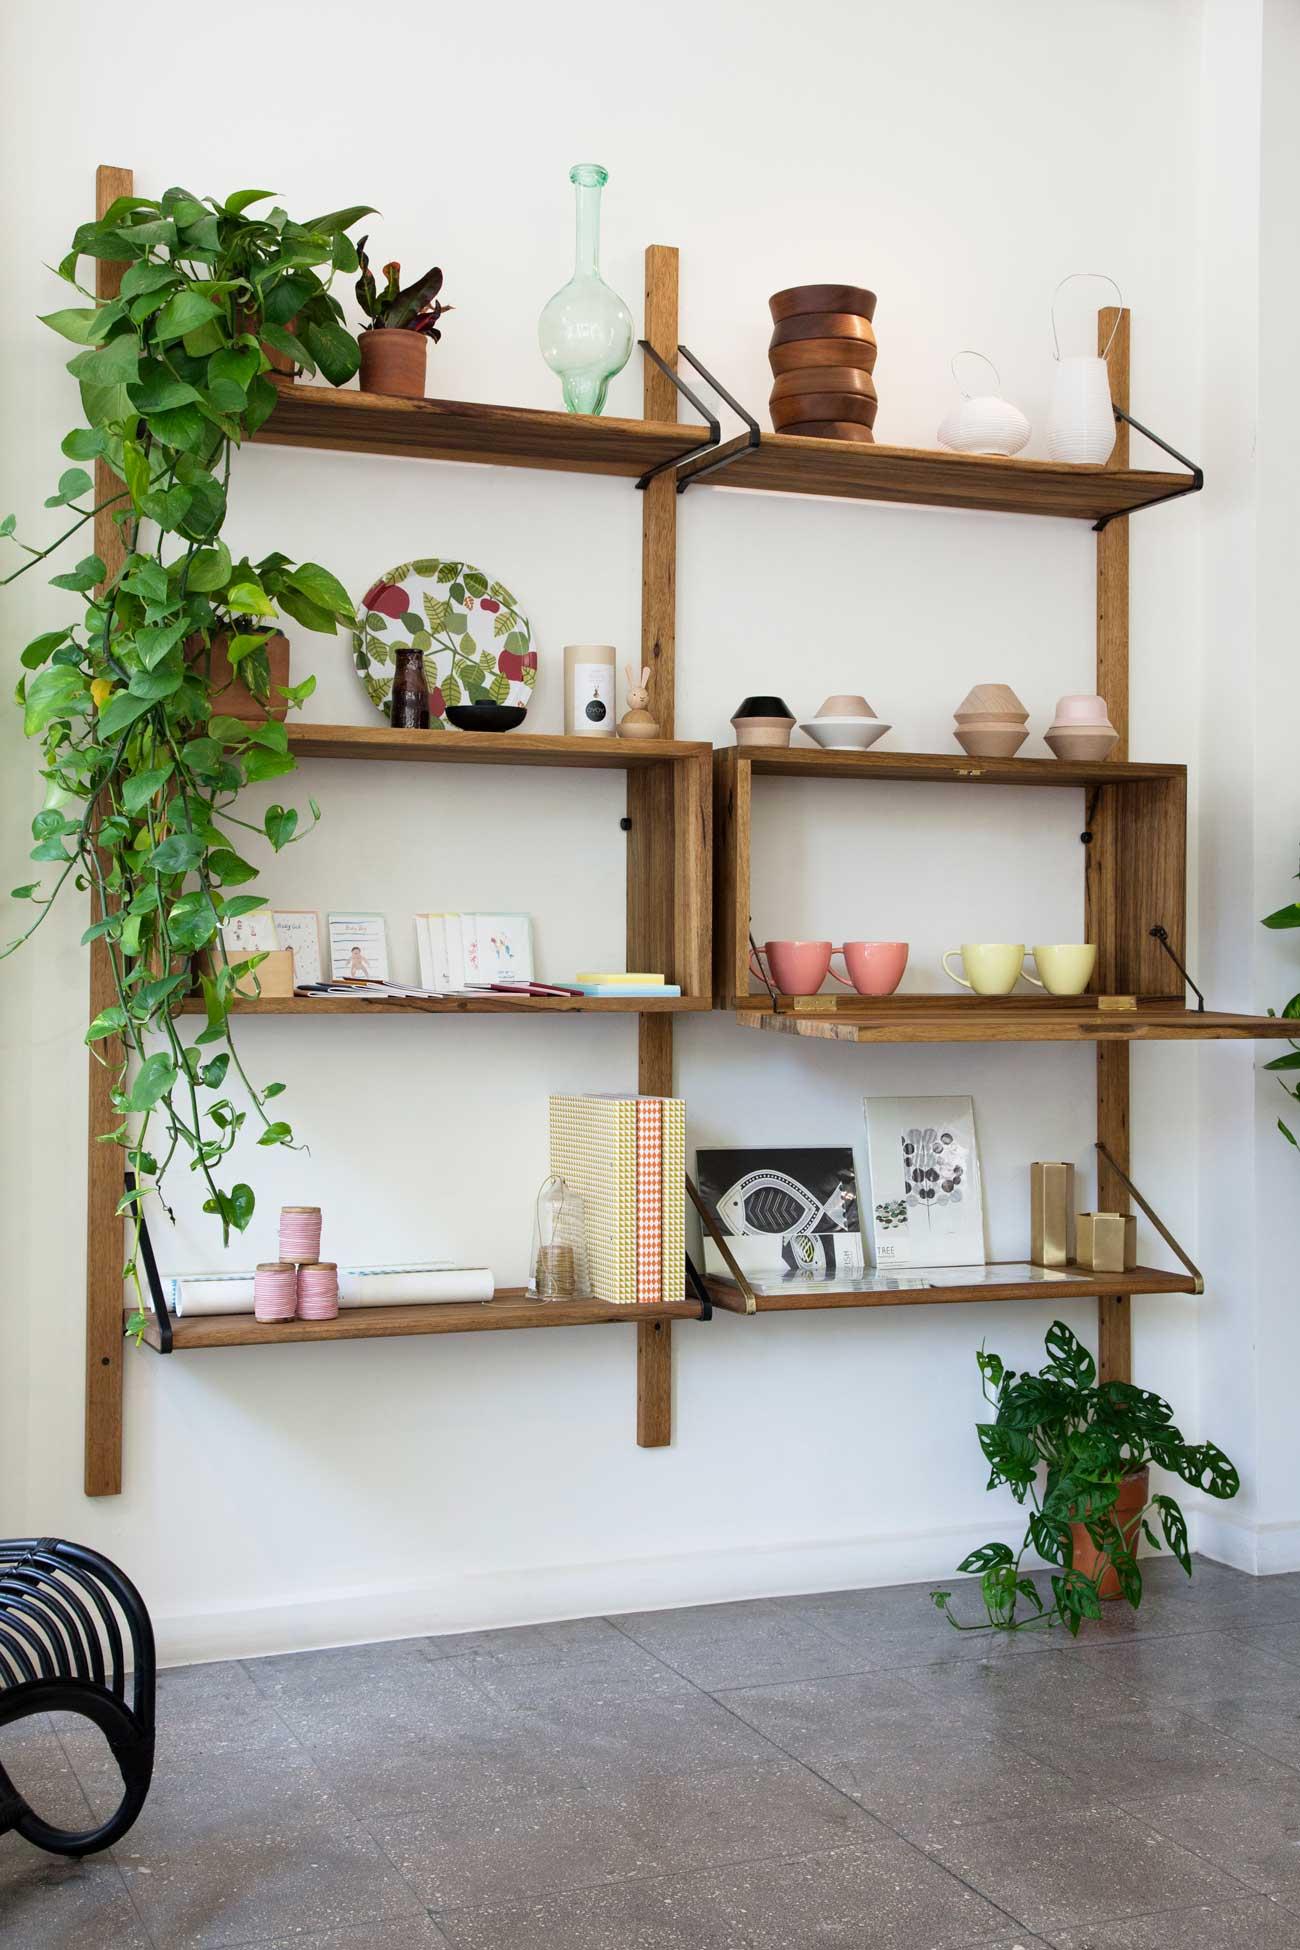 metal-and-wood-shelving-unit-wall-bar-kitchen-storage-2.jpg